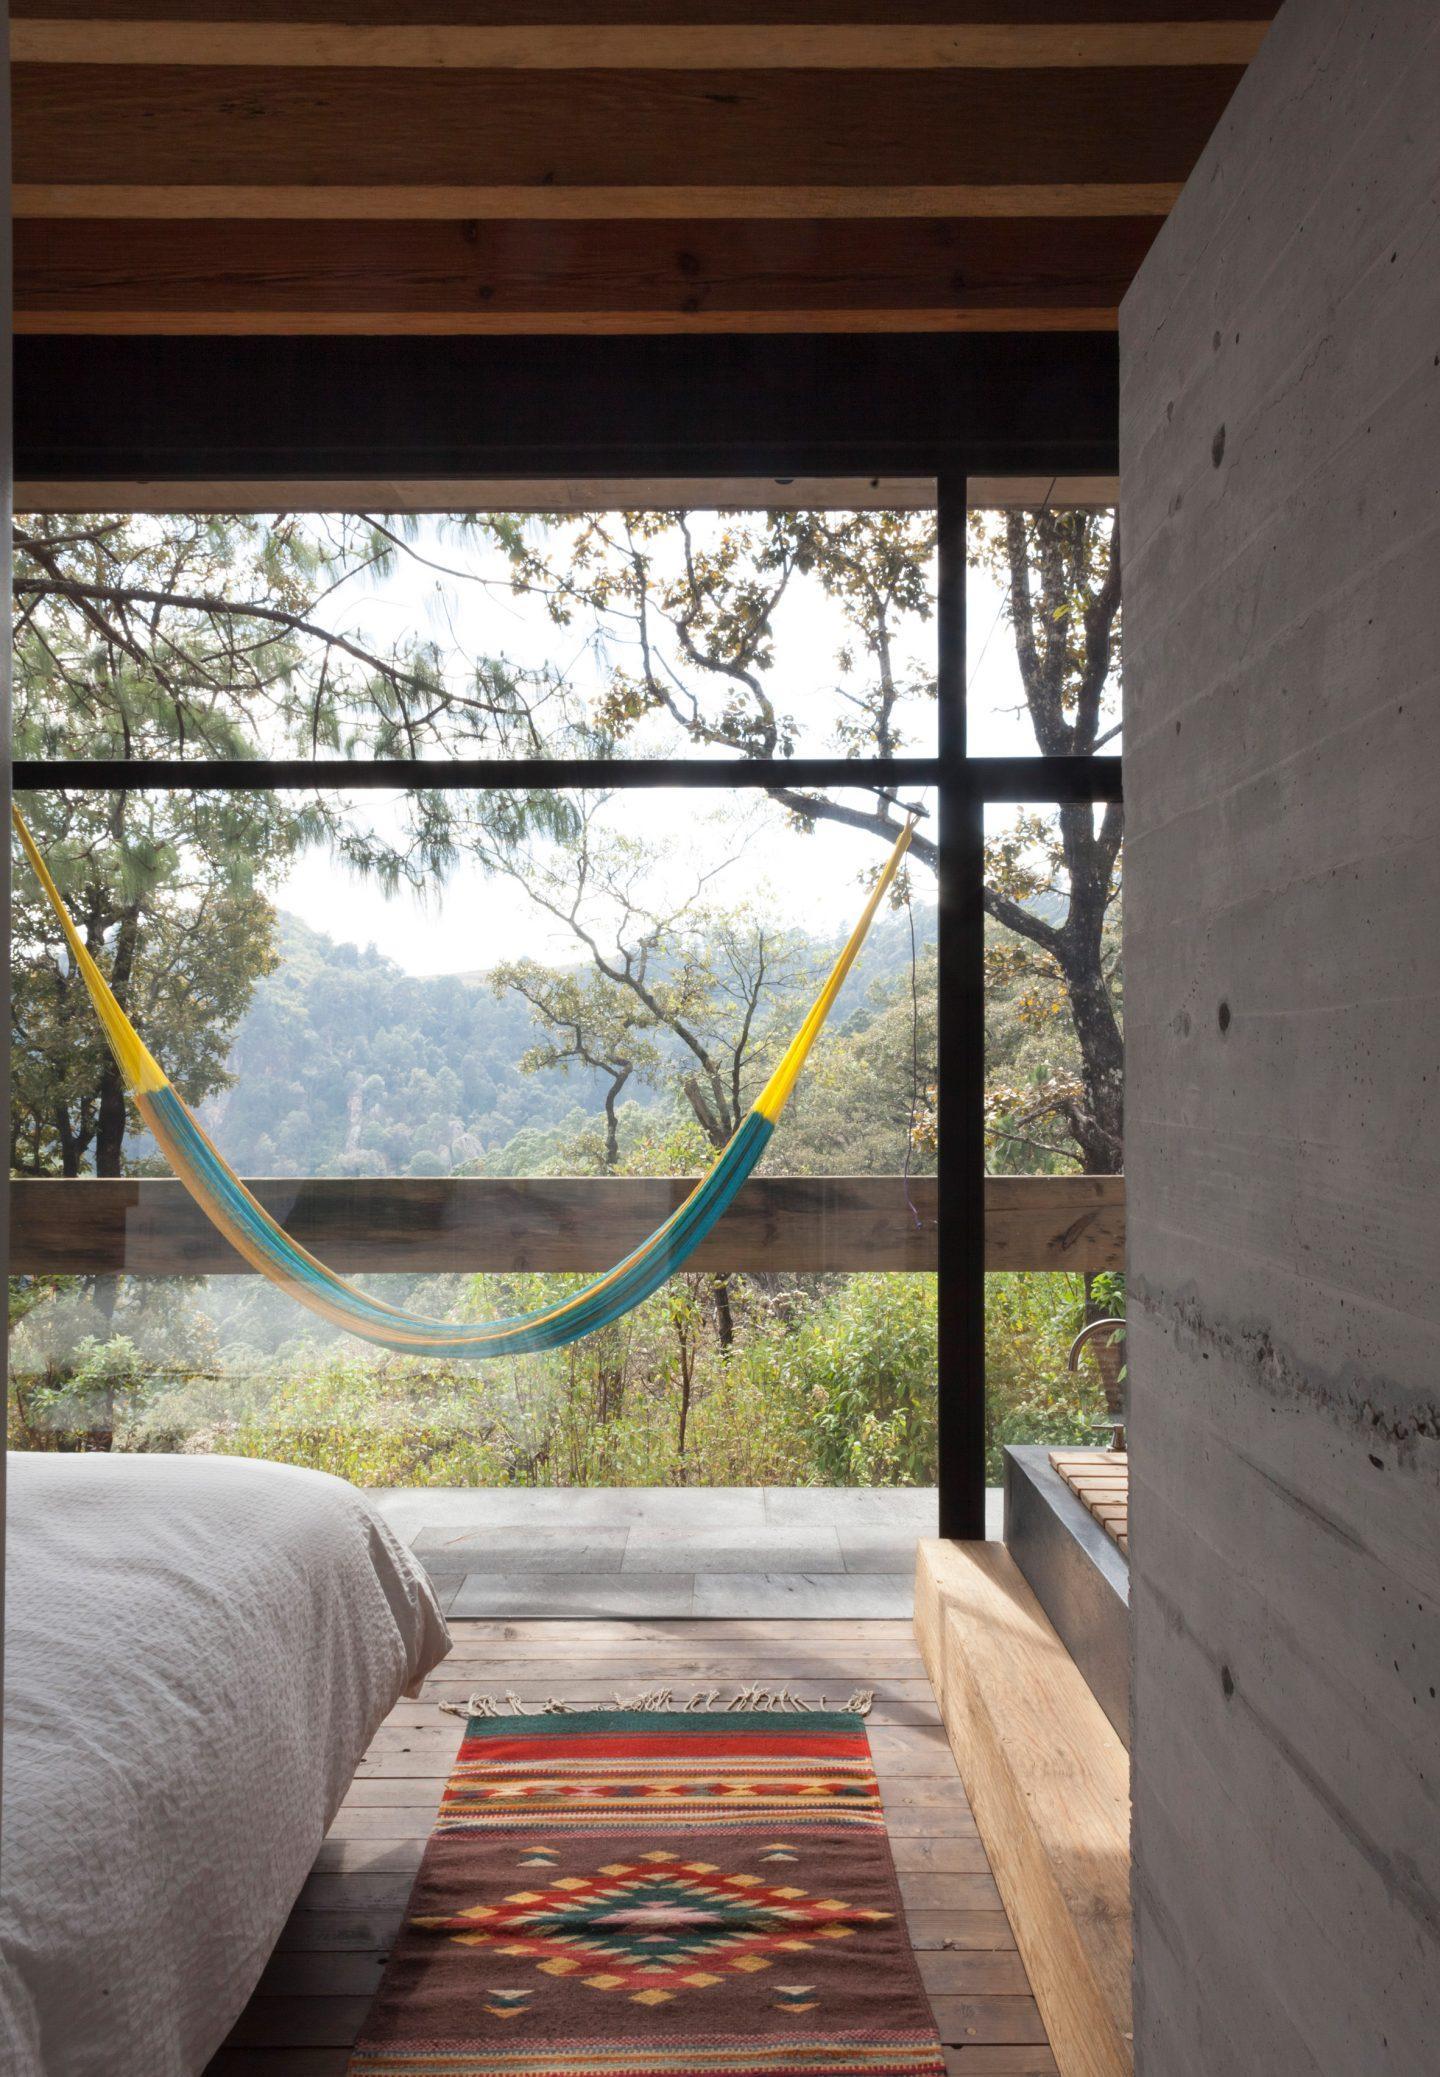 IGNANT-Architecture-Cadaval-Sola-Morales-Casa-De-La-Roca-10